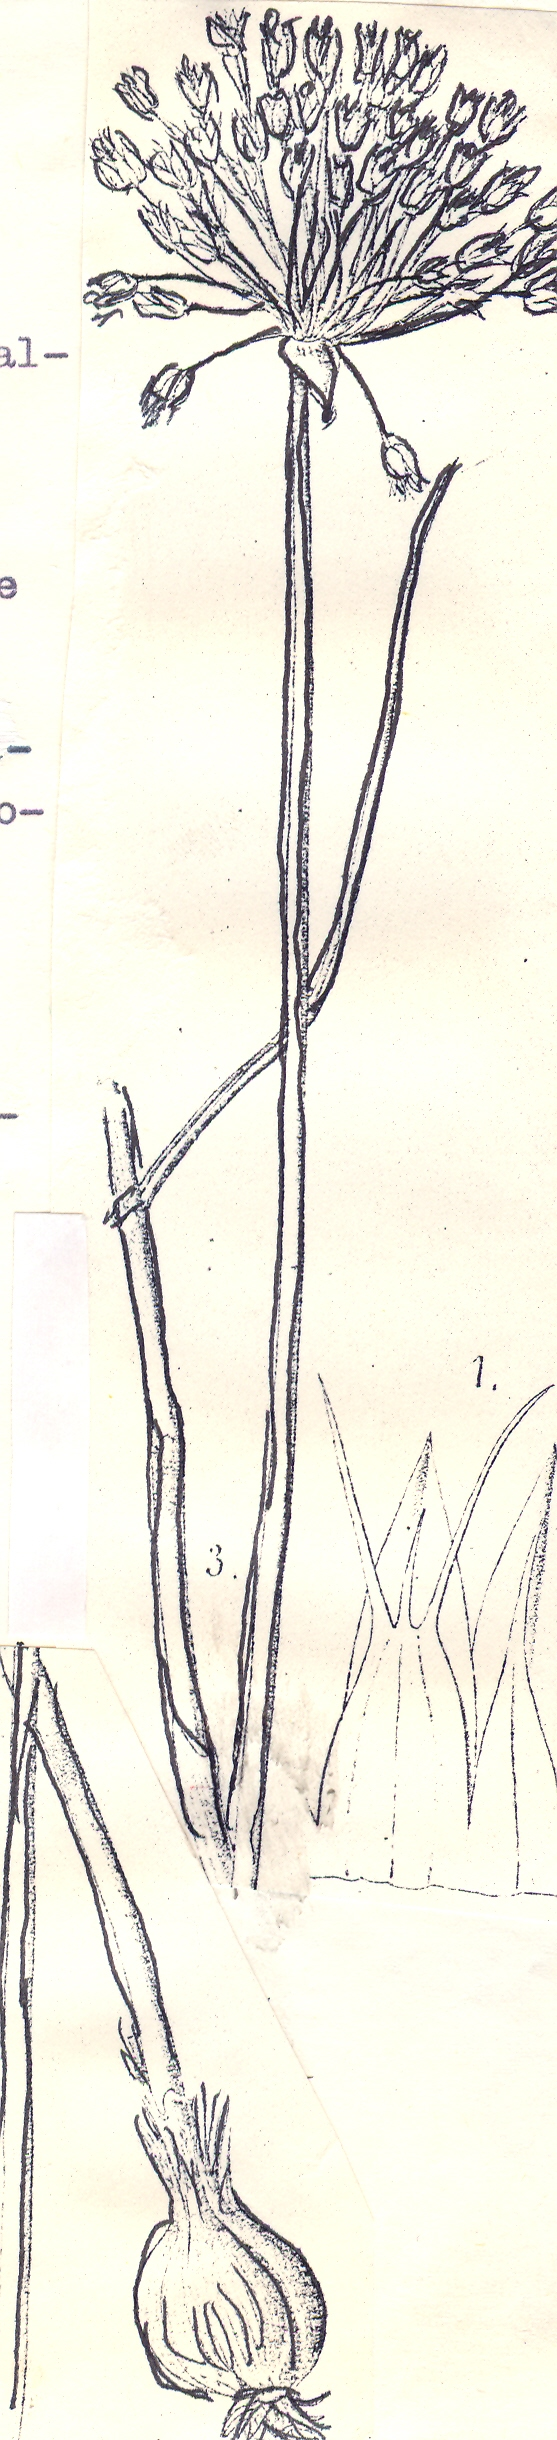 Allium%20karakense.jpg